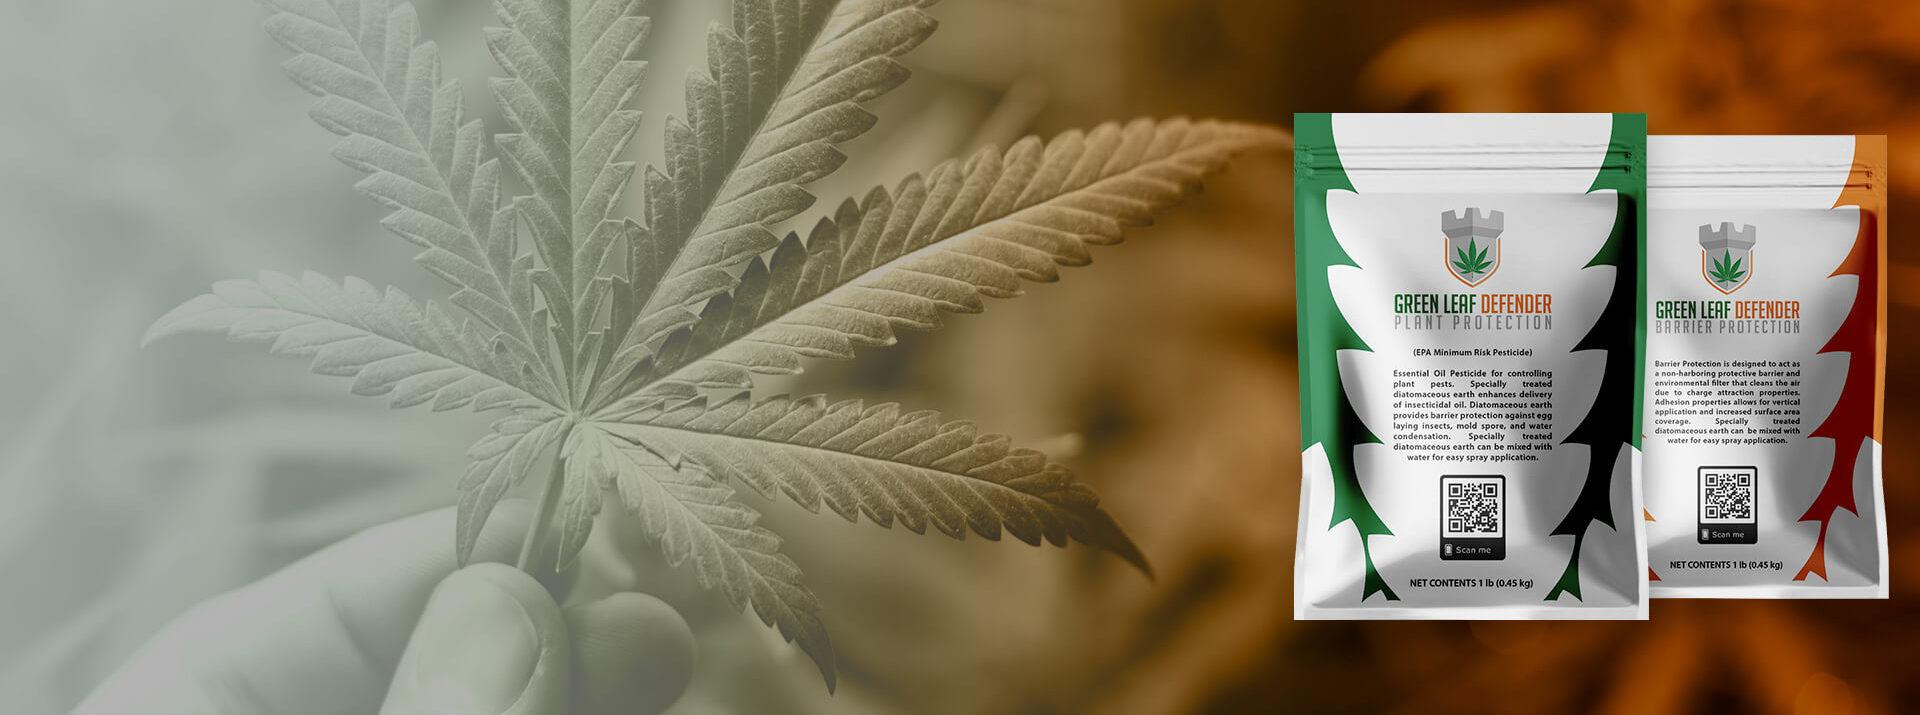 Cannabis Bacteria, Pests & Mold Treatment